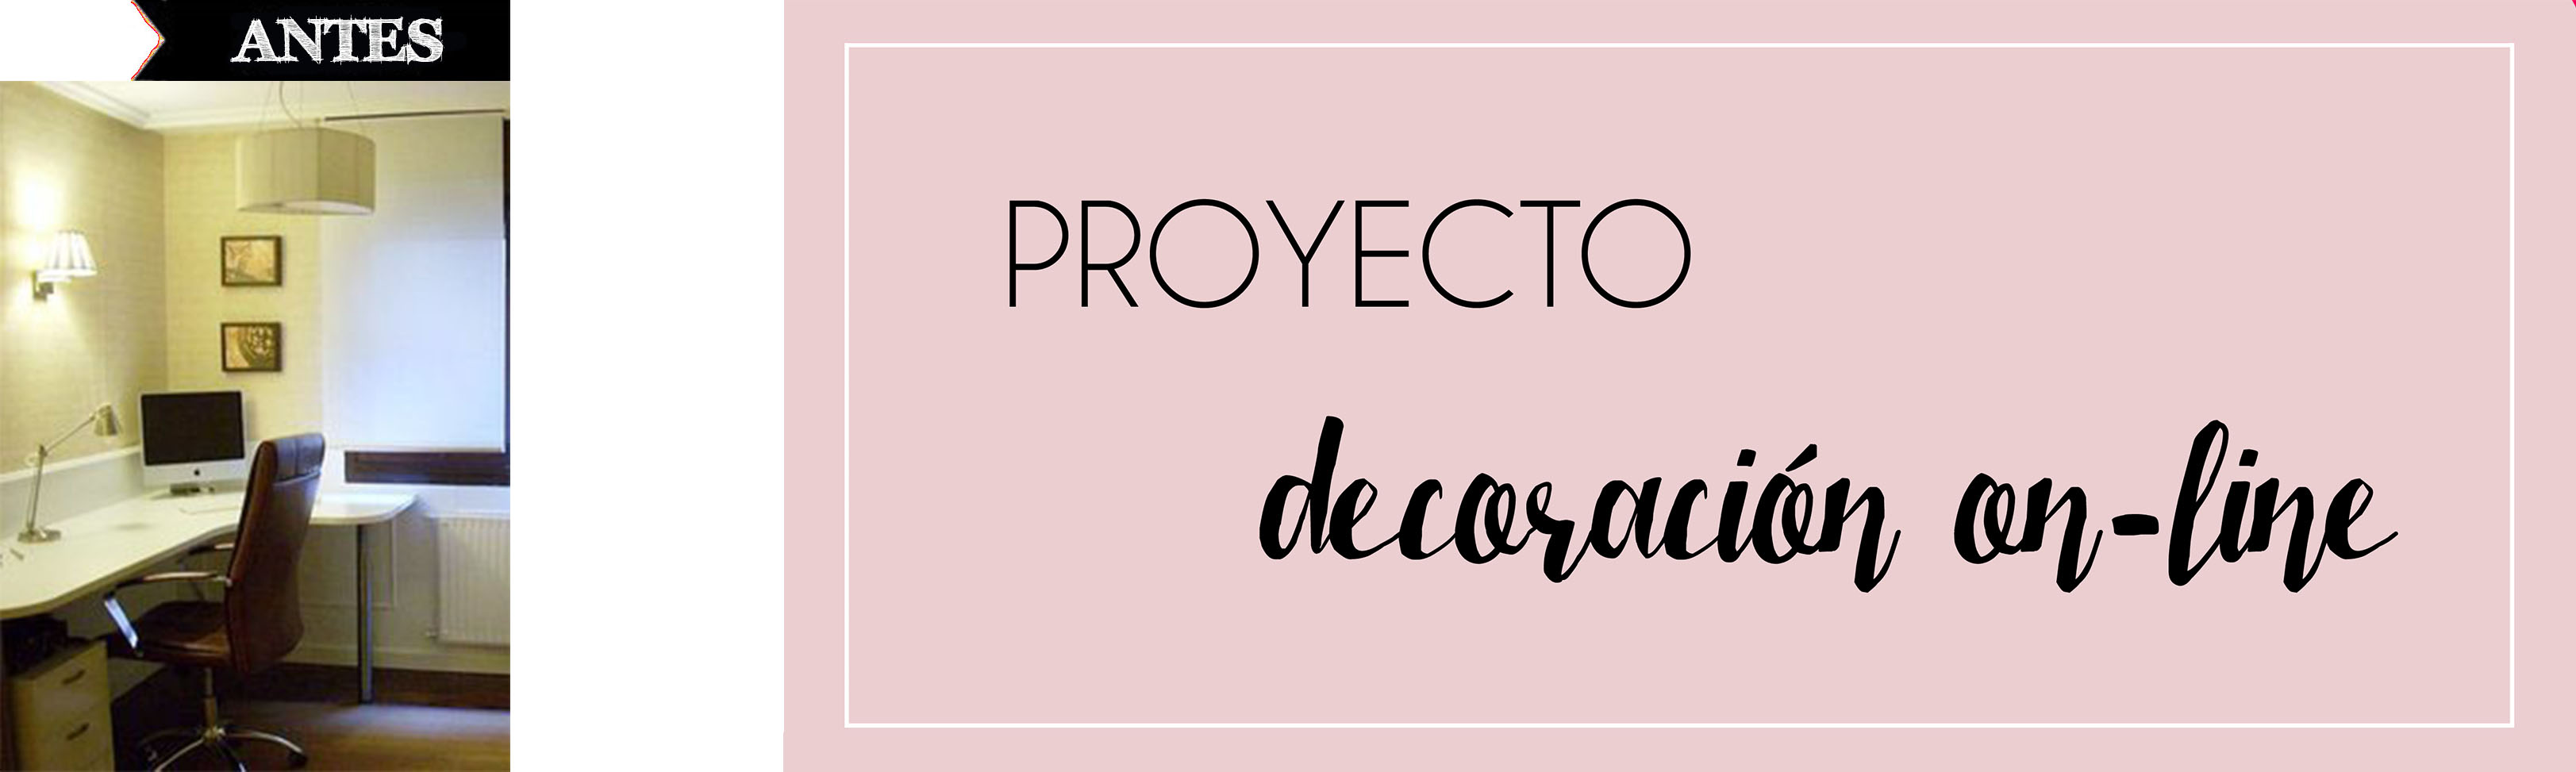 proyecto-antes2